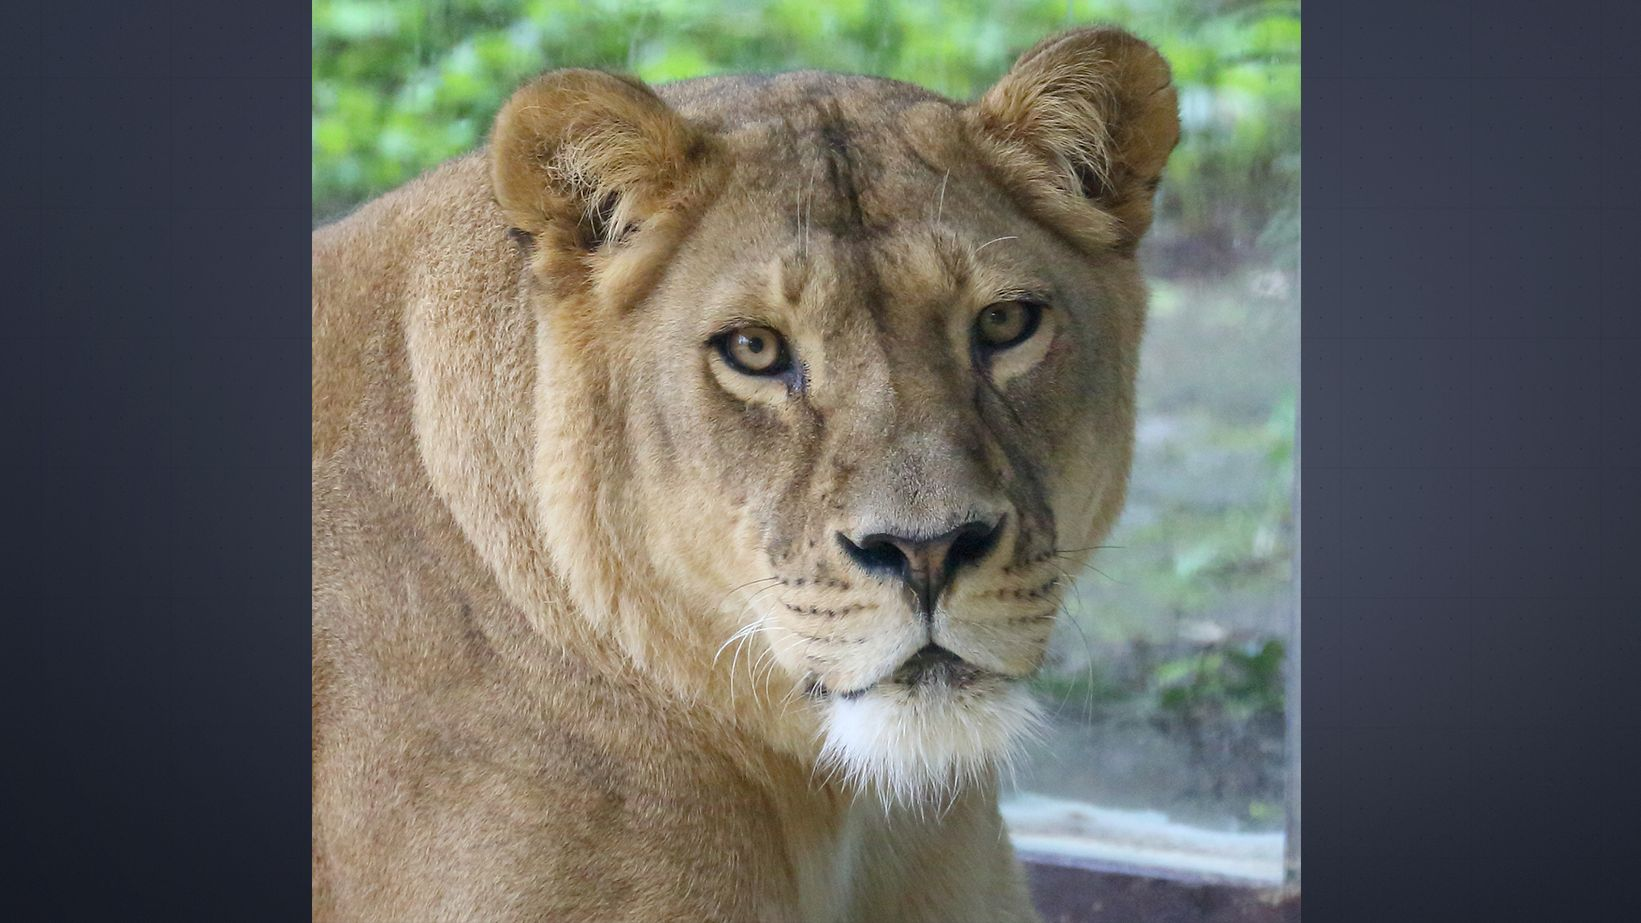 Die Löwin Tara im Augsburger Zoo